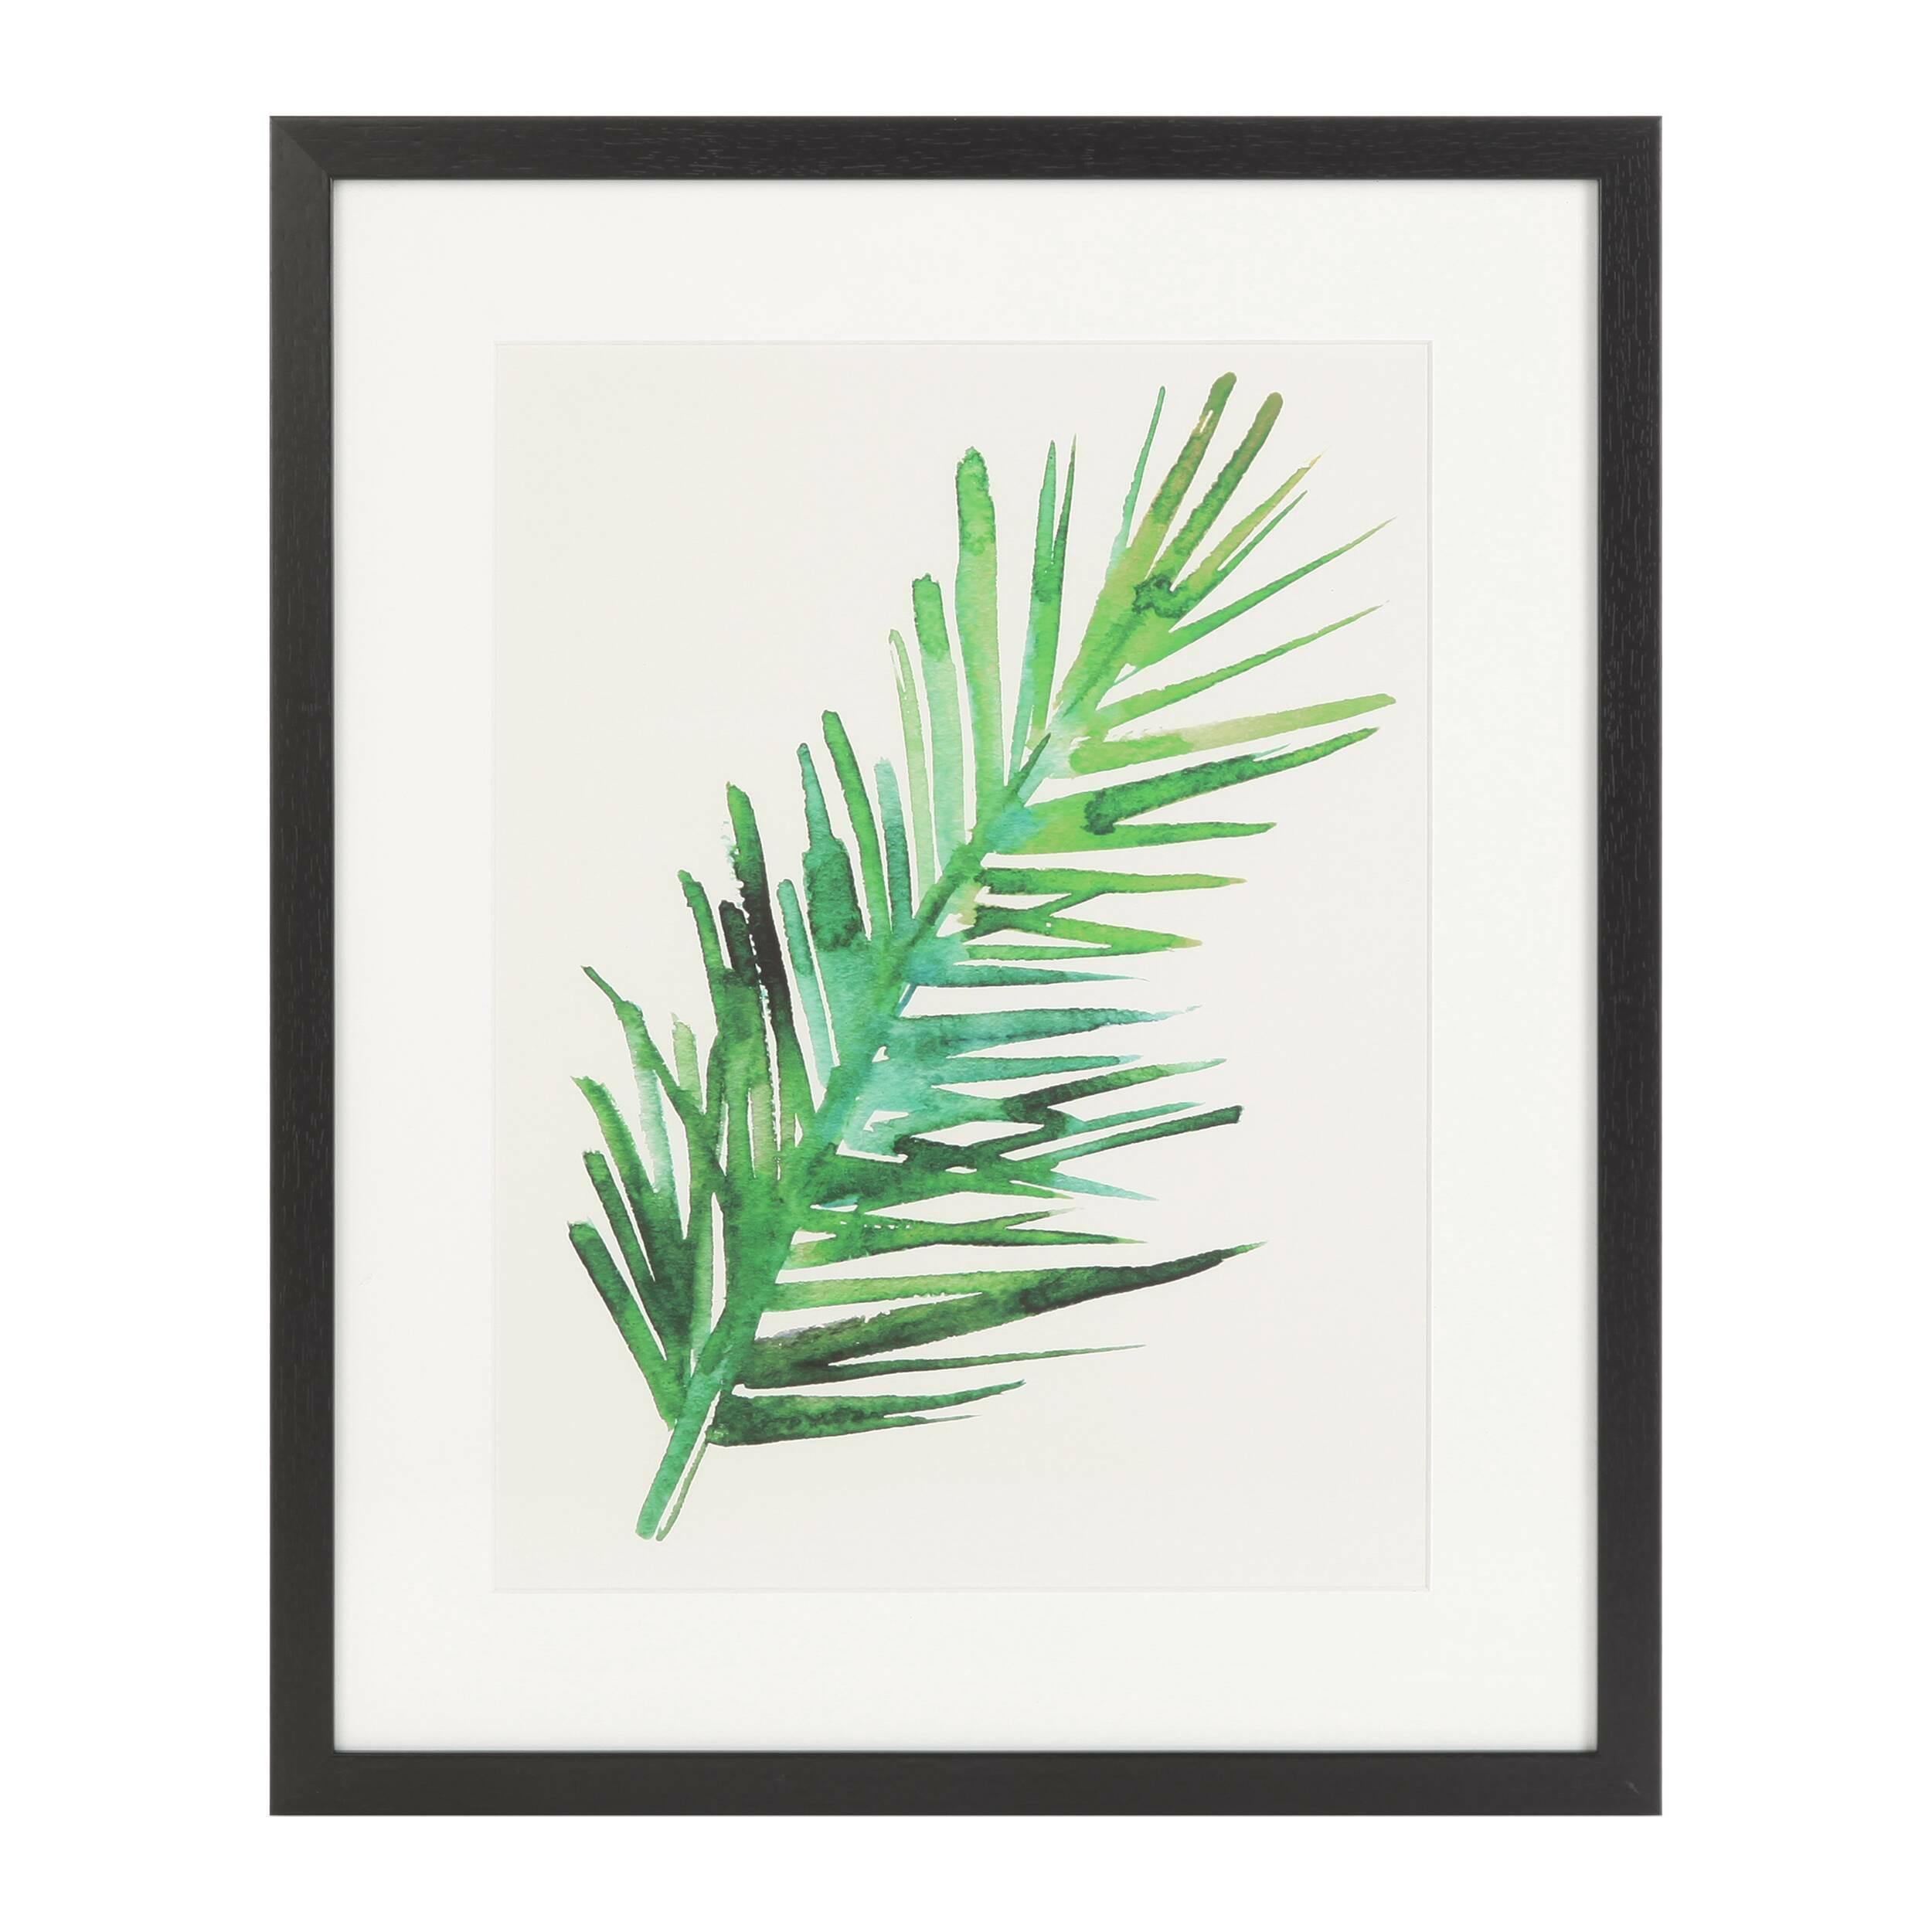 Постер Palm 2Картины<br><br><br>stock: 10<br>Ширина: 43<br>Цвет: Зеленый<br>Длина: 53